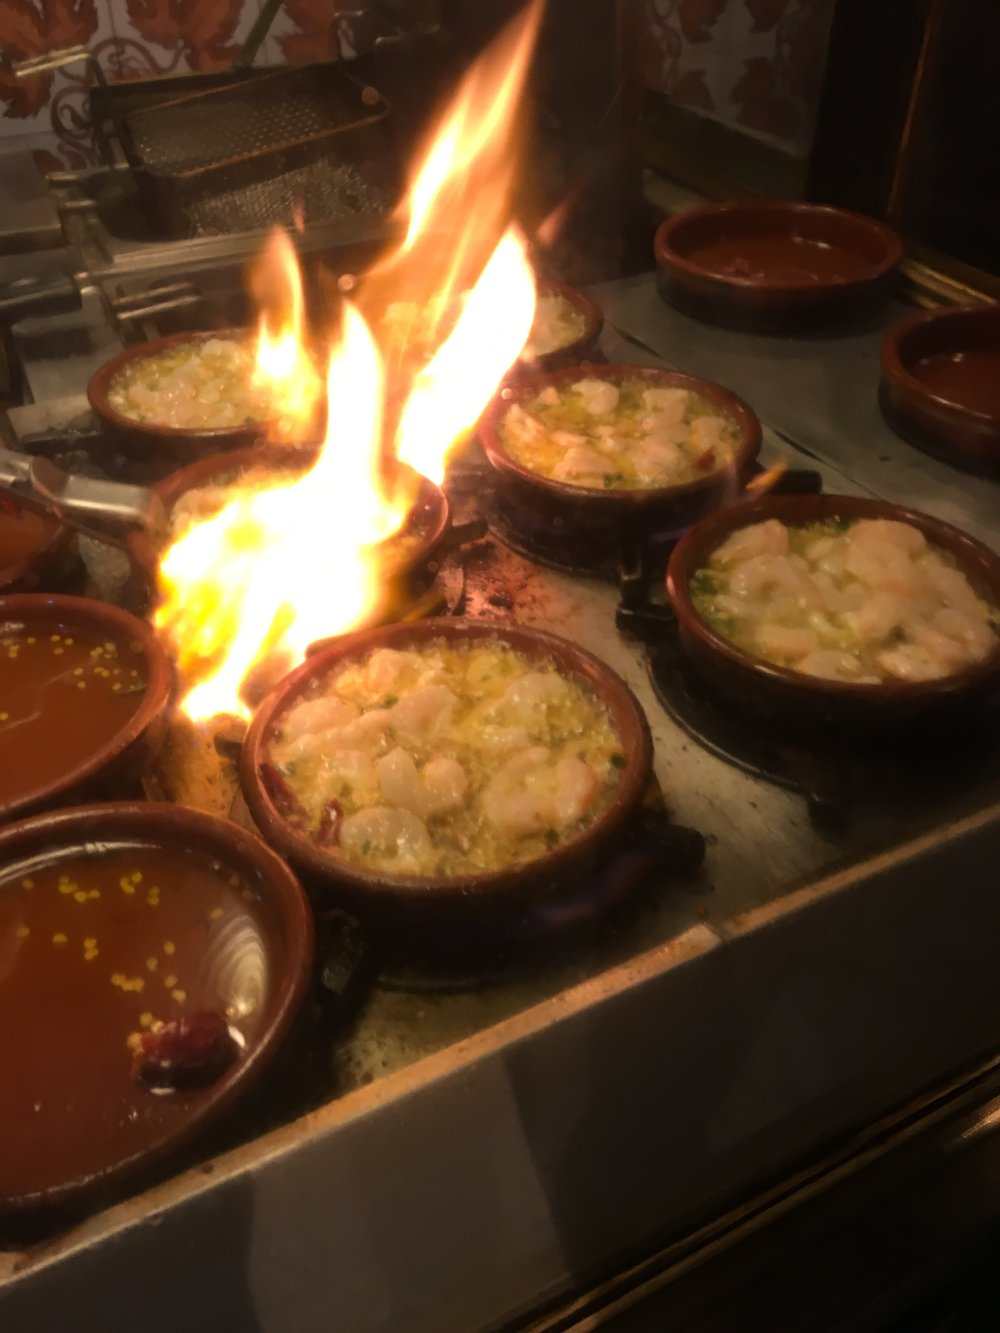 Flaming Gambas ala Ajillo in Spain - 2016